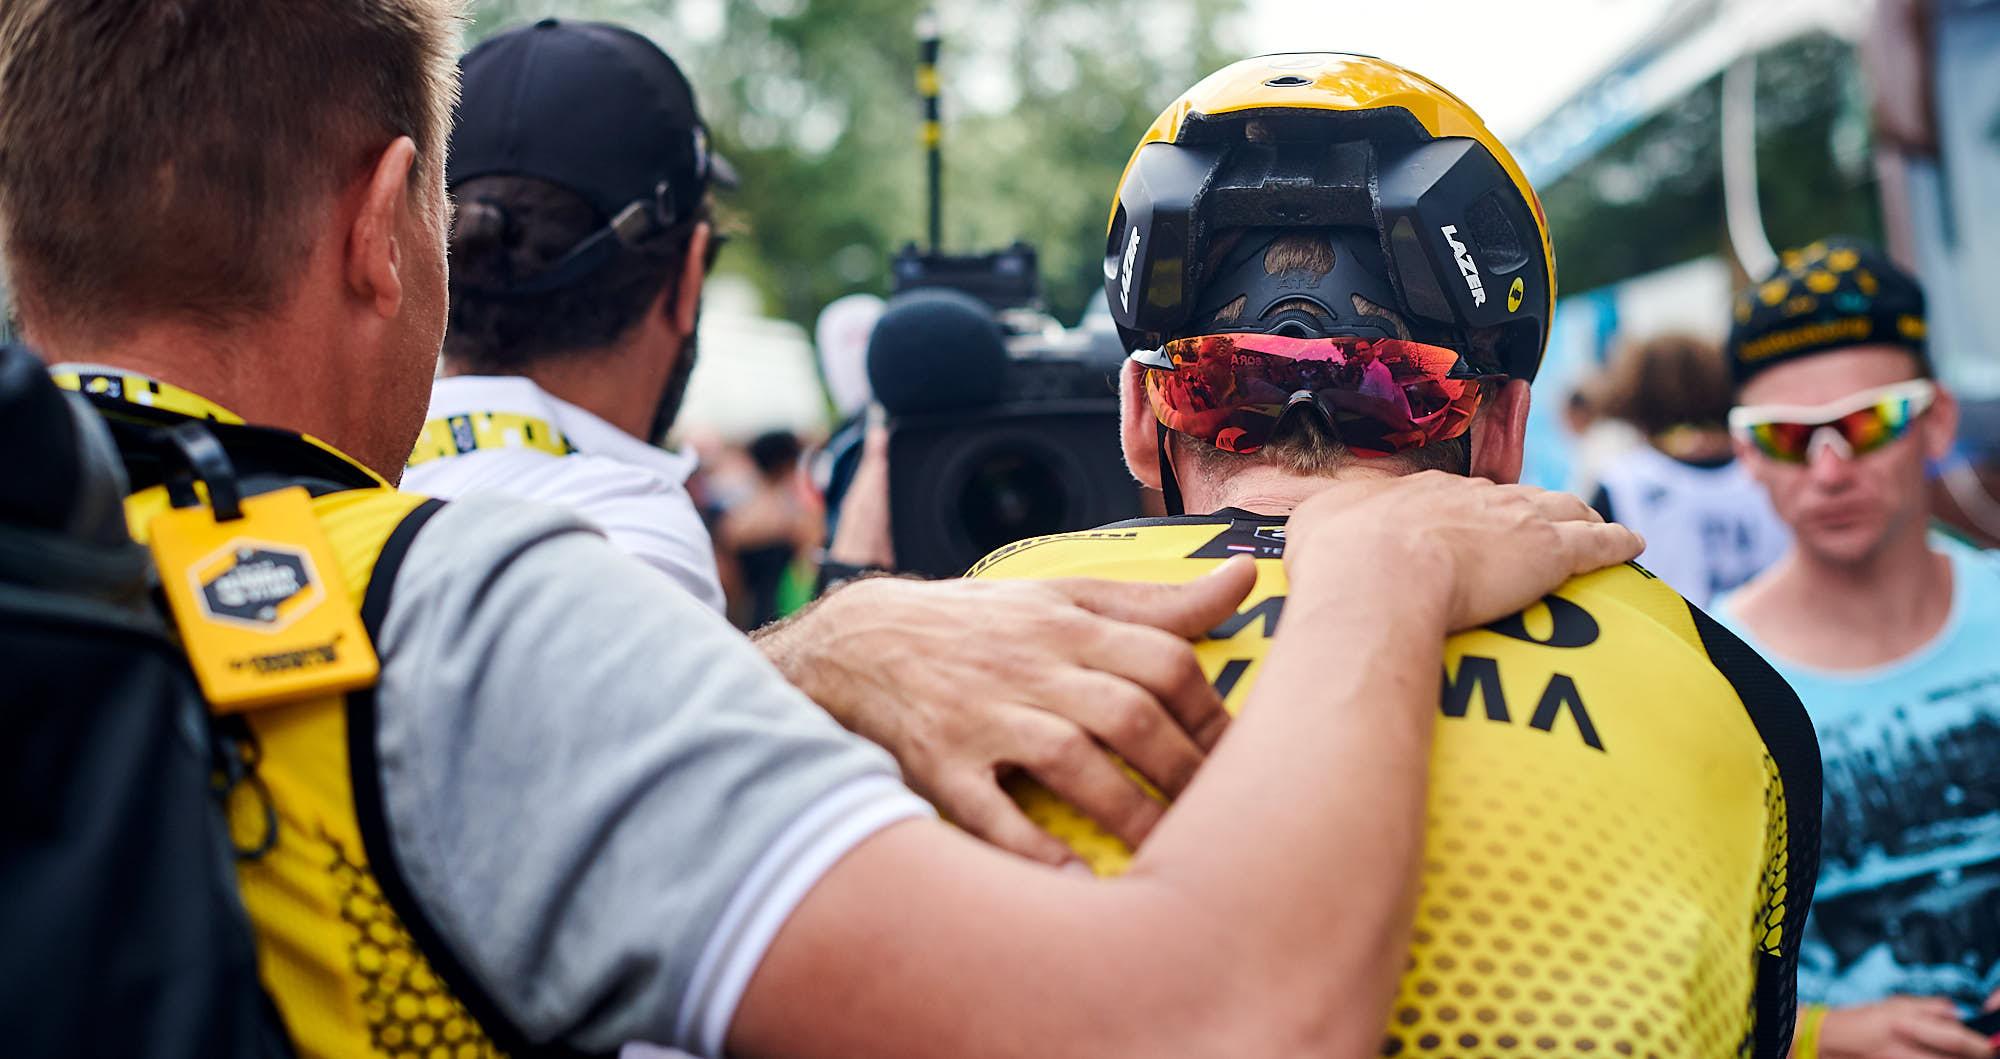 Soigneur leading Mike Teunissen to the Tour de France podium